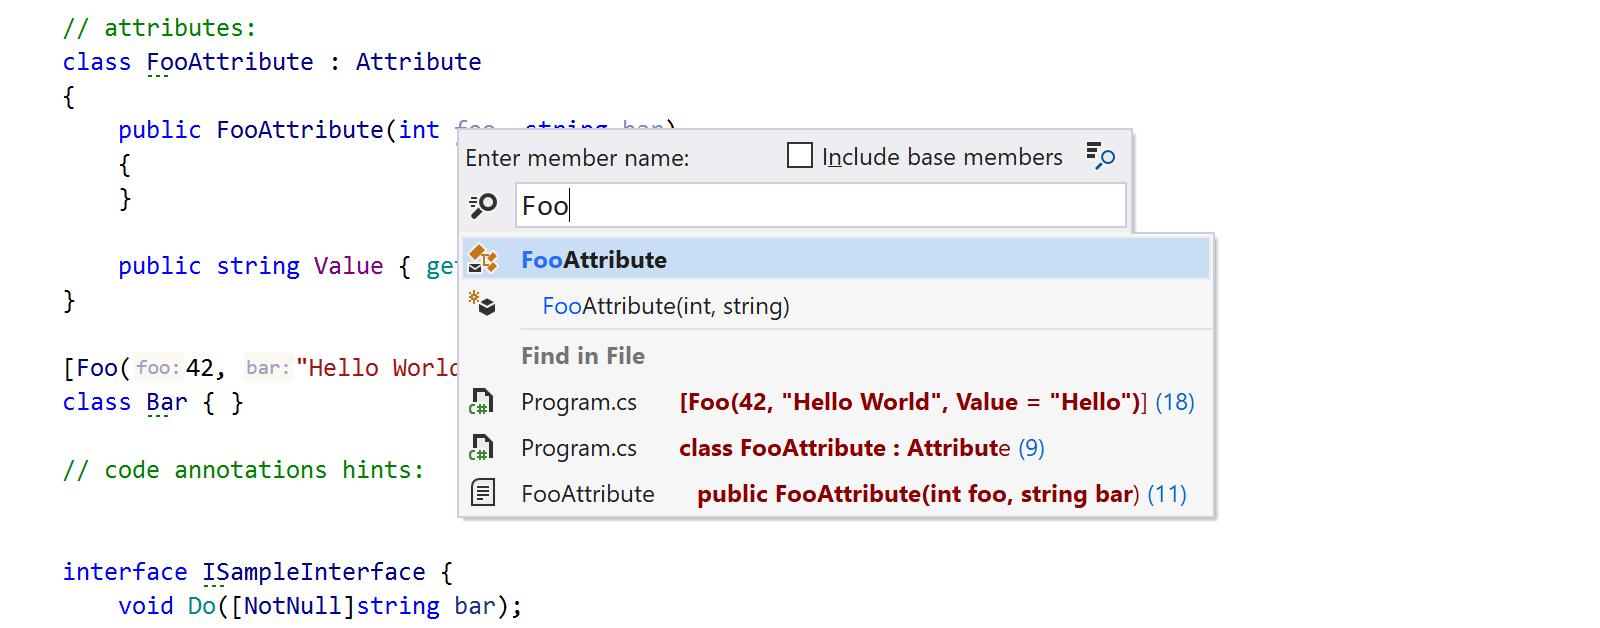 Find in Files in Go to File Member